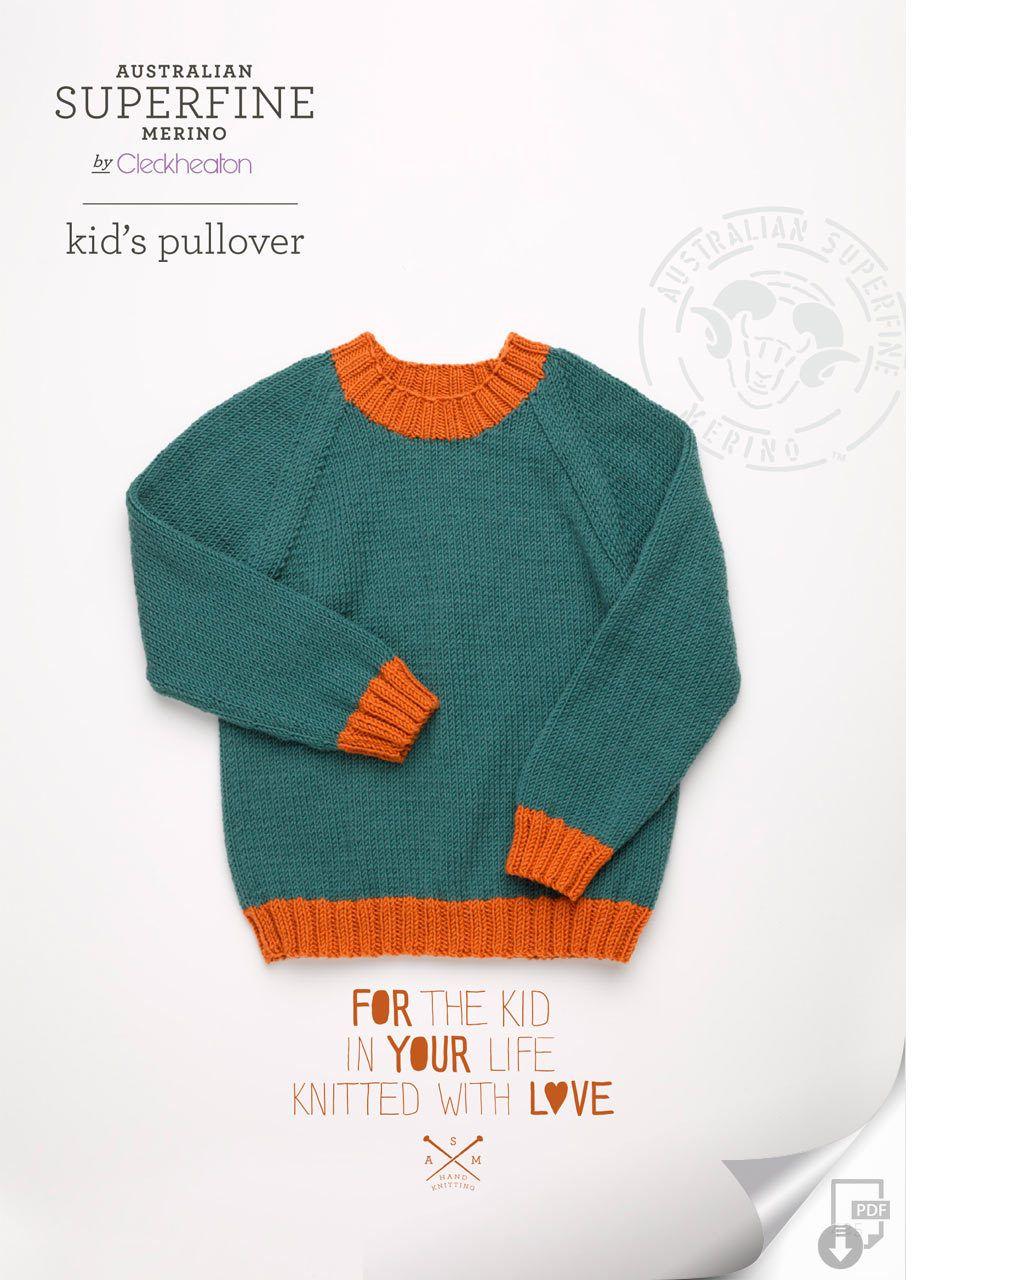 Cleckheaton Superfine - FREE Kids Pullover, $0.00 (http://www.cleckheatonsuperfine.com.au/free-kids-pullover/)